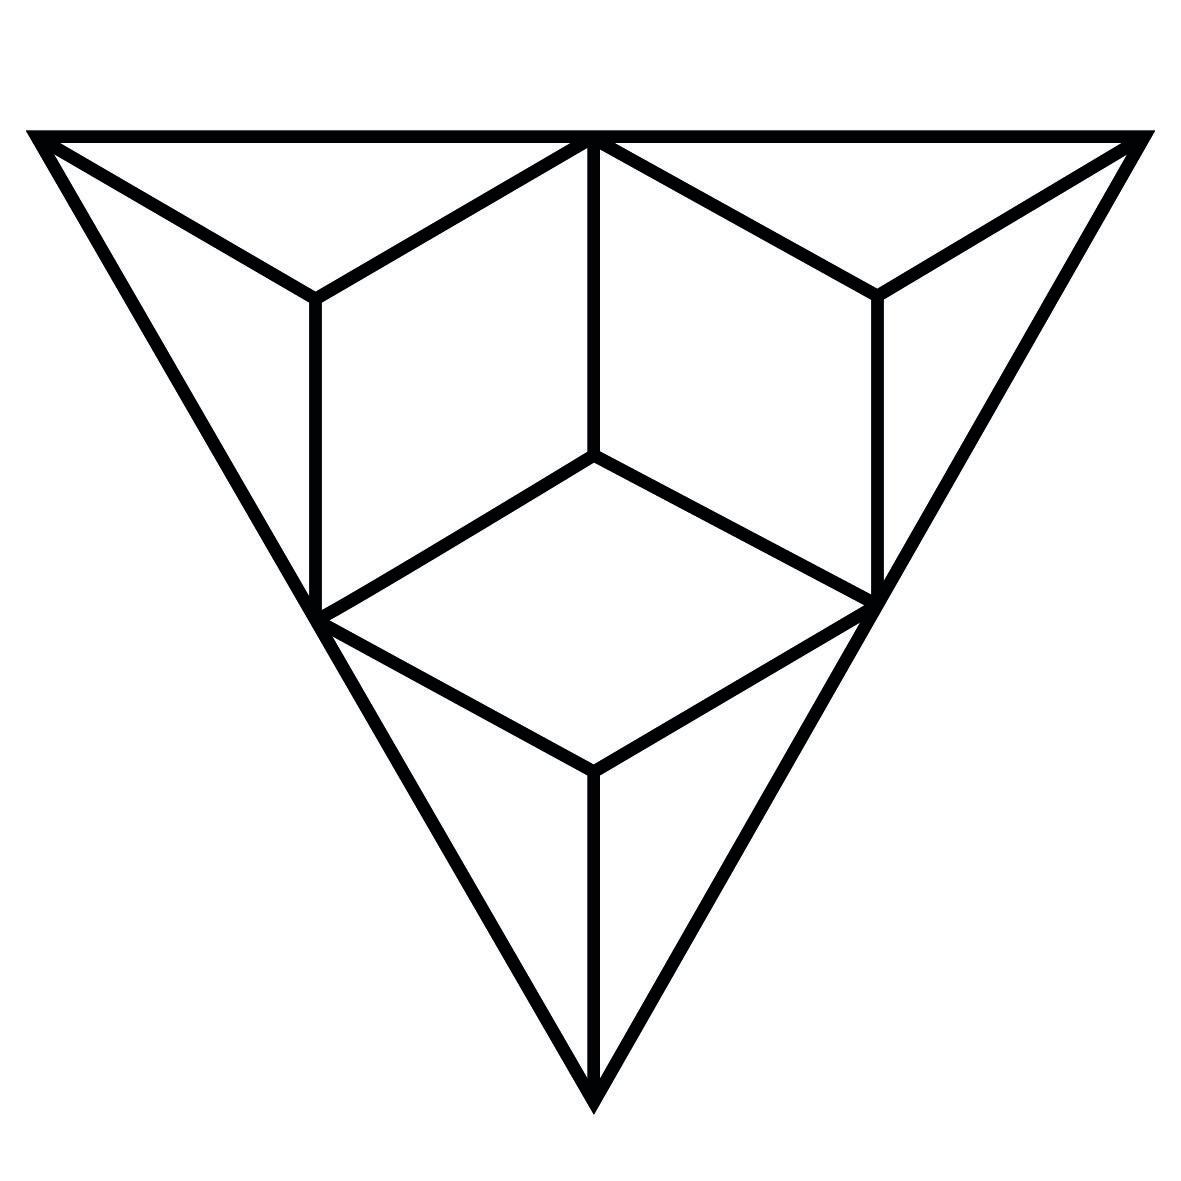 1181x1181 Origami Paper Triangle Tattoos